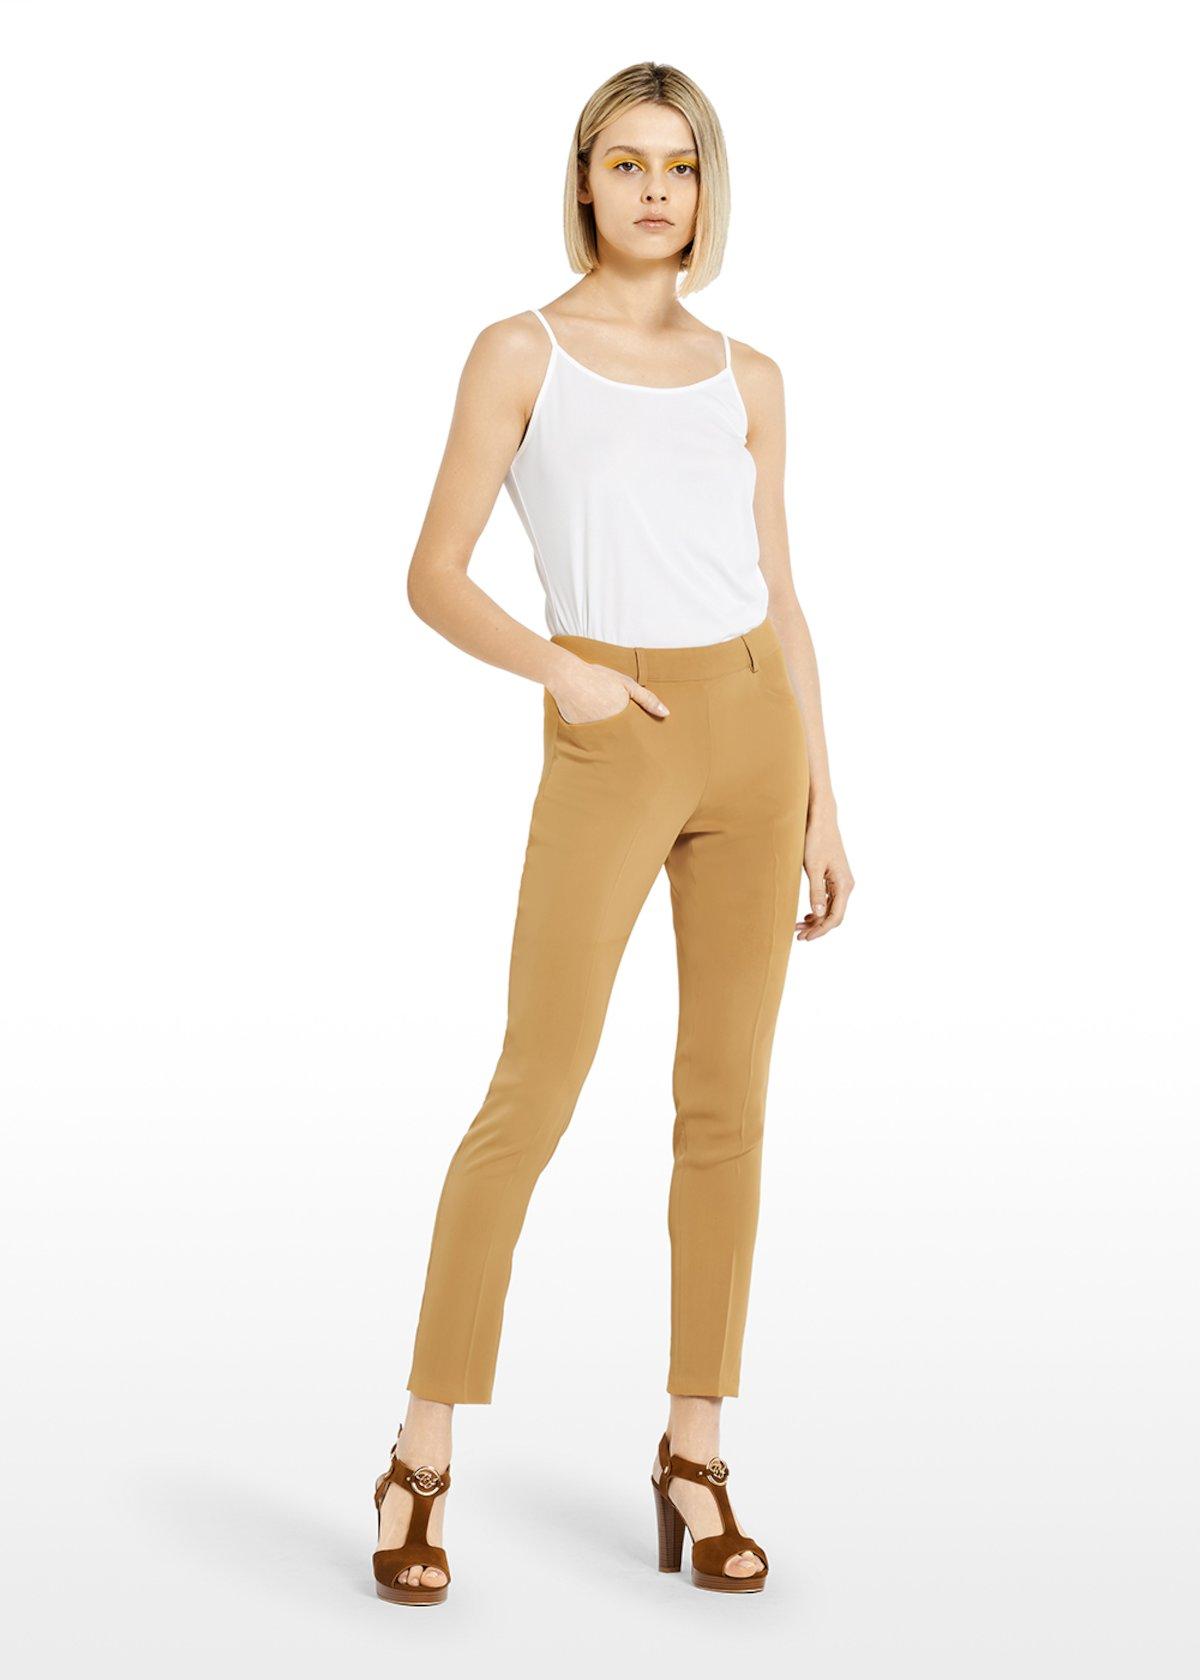 Capri pants Perli Scarlett design with slim leg - Brown - Woman - Category image